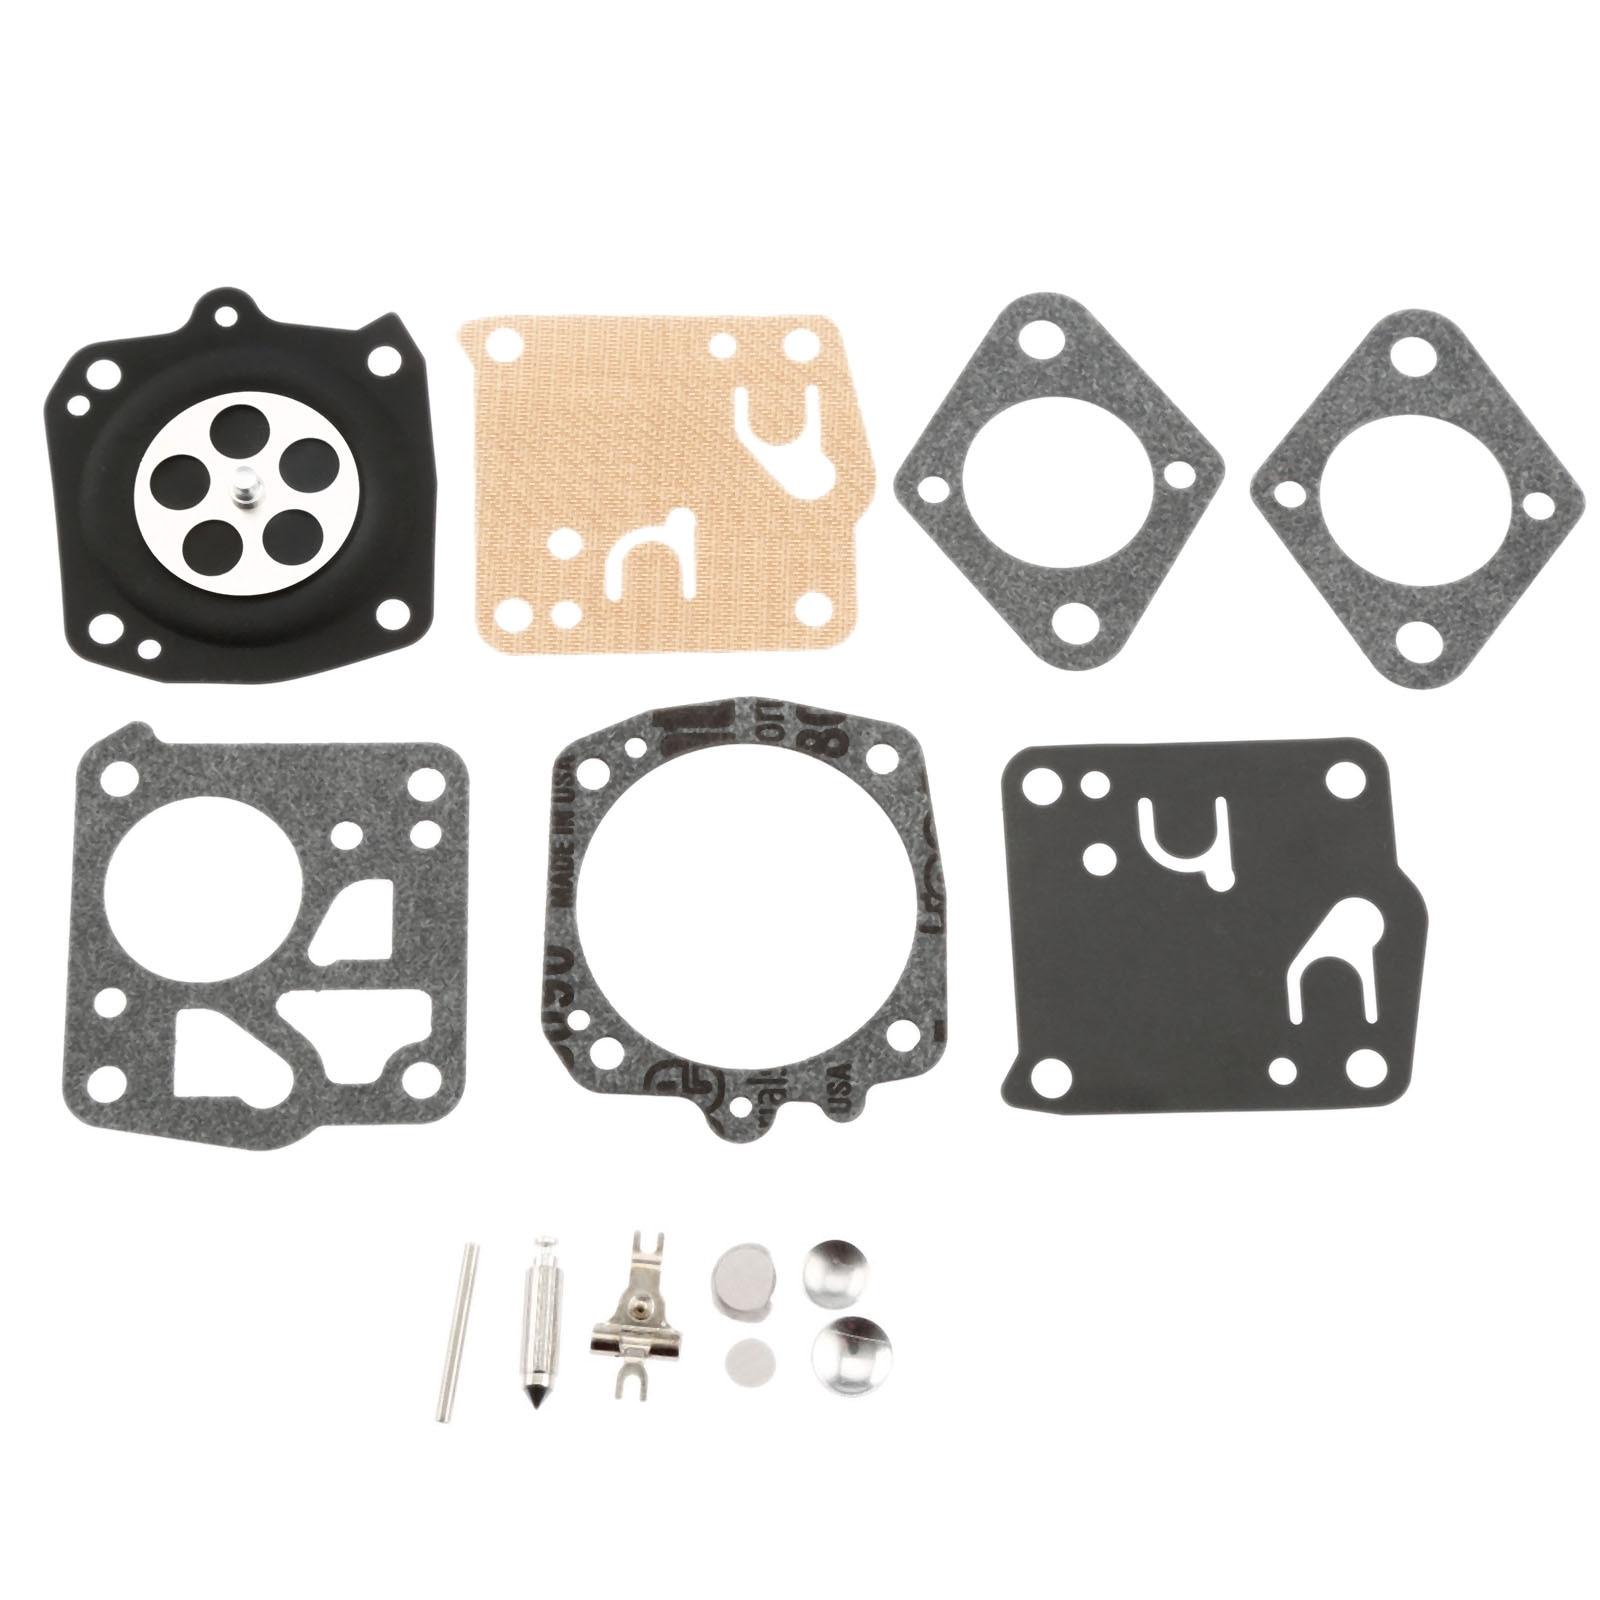 Vergaser Carb Reparatur Rebuild Kit Jonsered 625 630 670 920 930 Tillotson Set